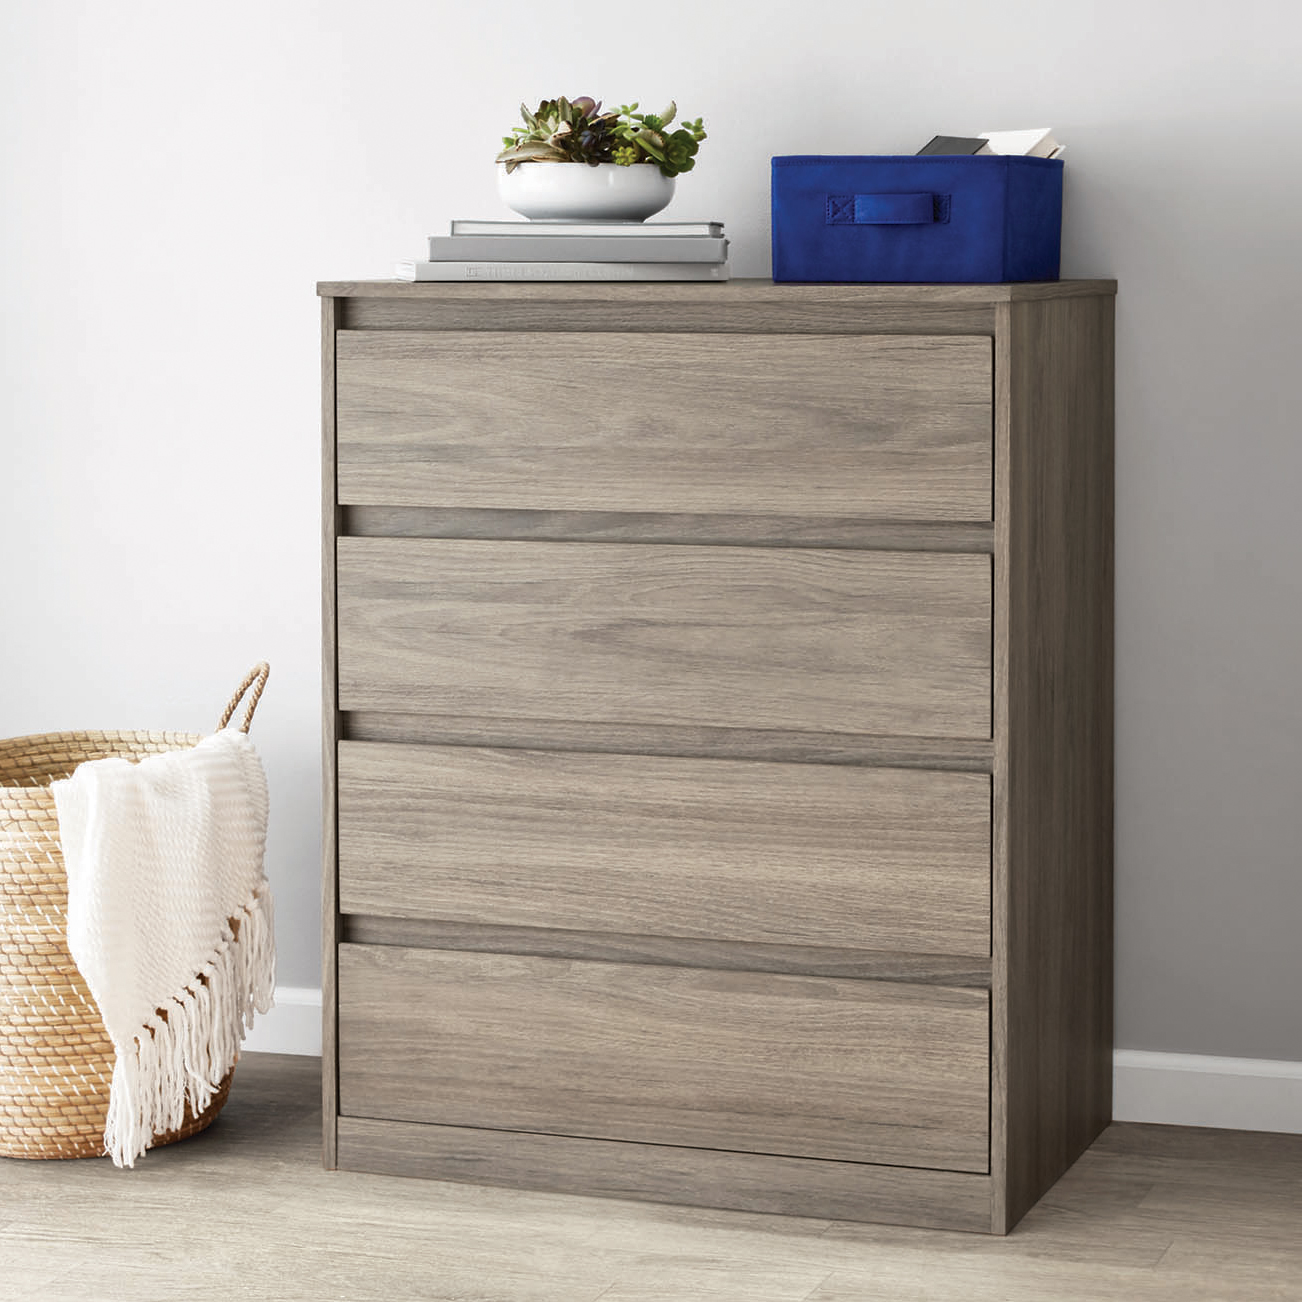 Mainstays Westlake 4 Drawer Dresser, Rustic Oak